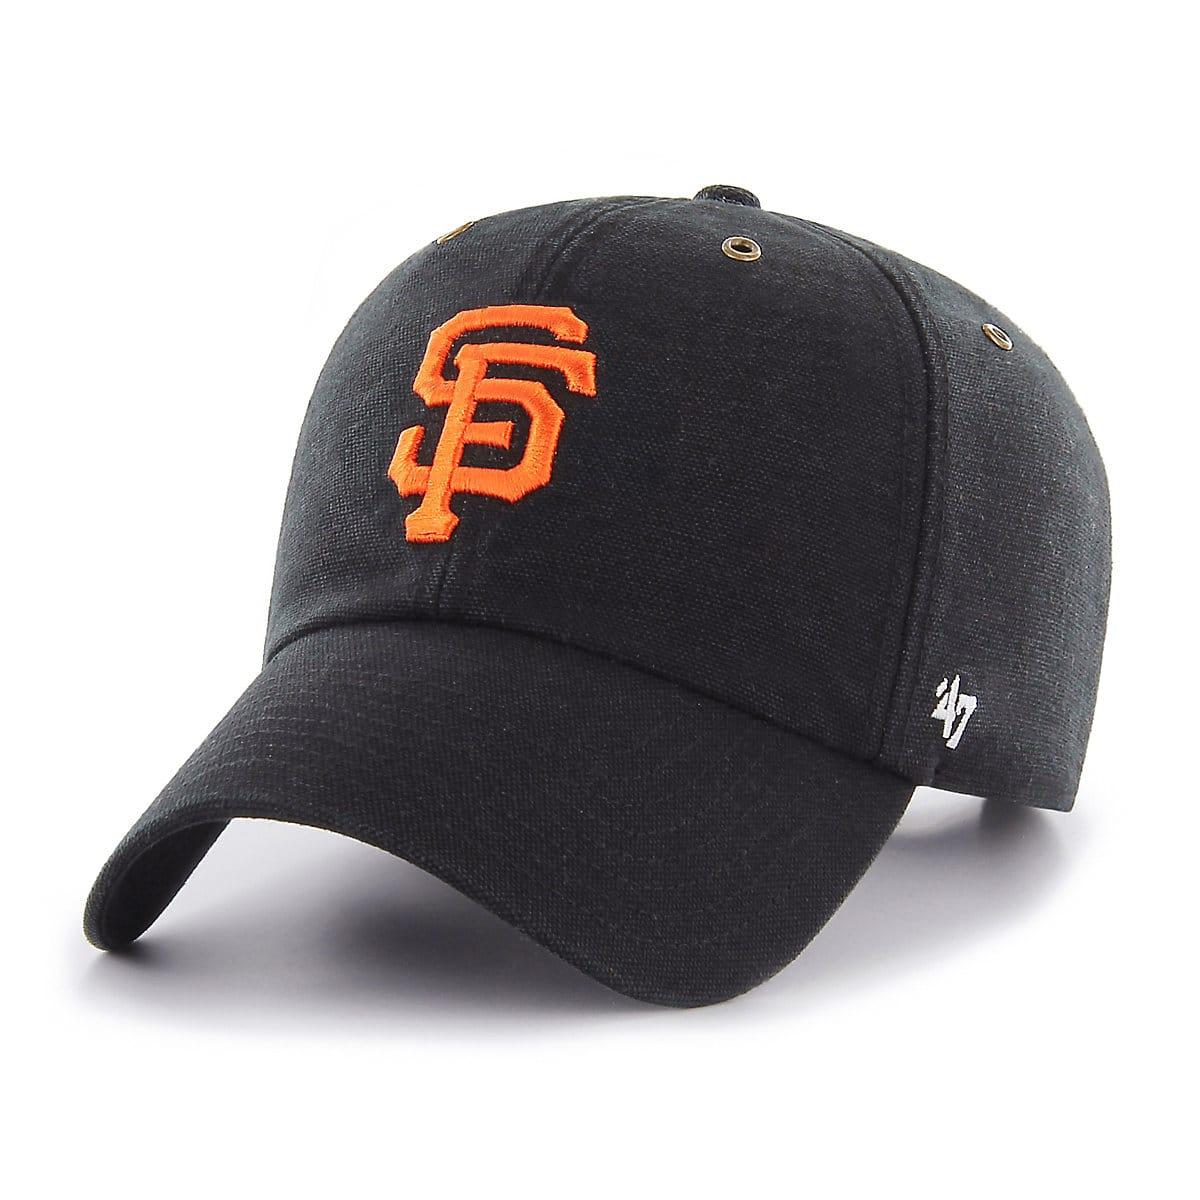 313f9dc09 Men's San Francisco Giants Carhartt x '47 Clean Up | Carhartt